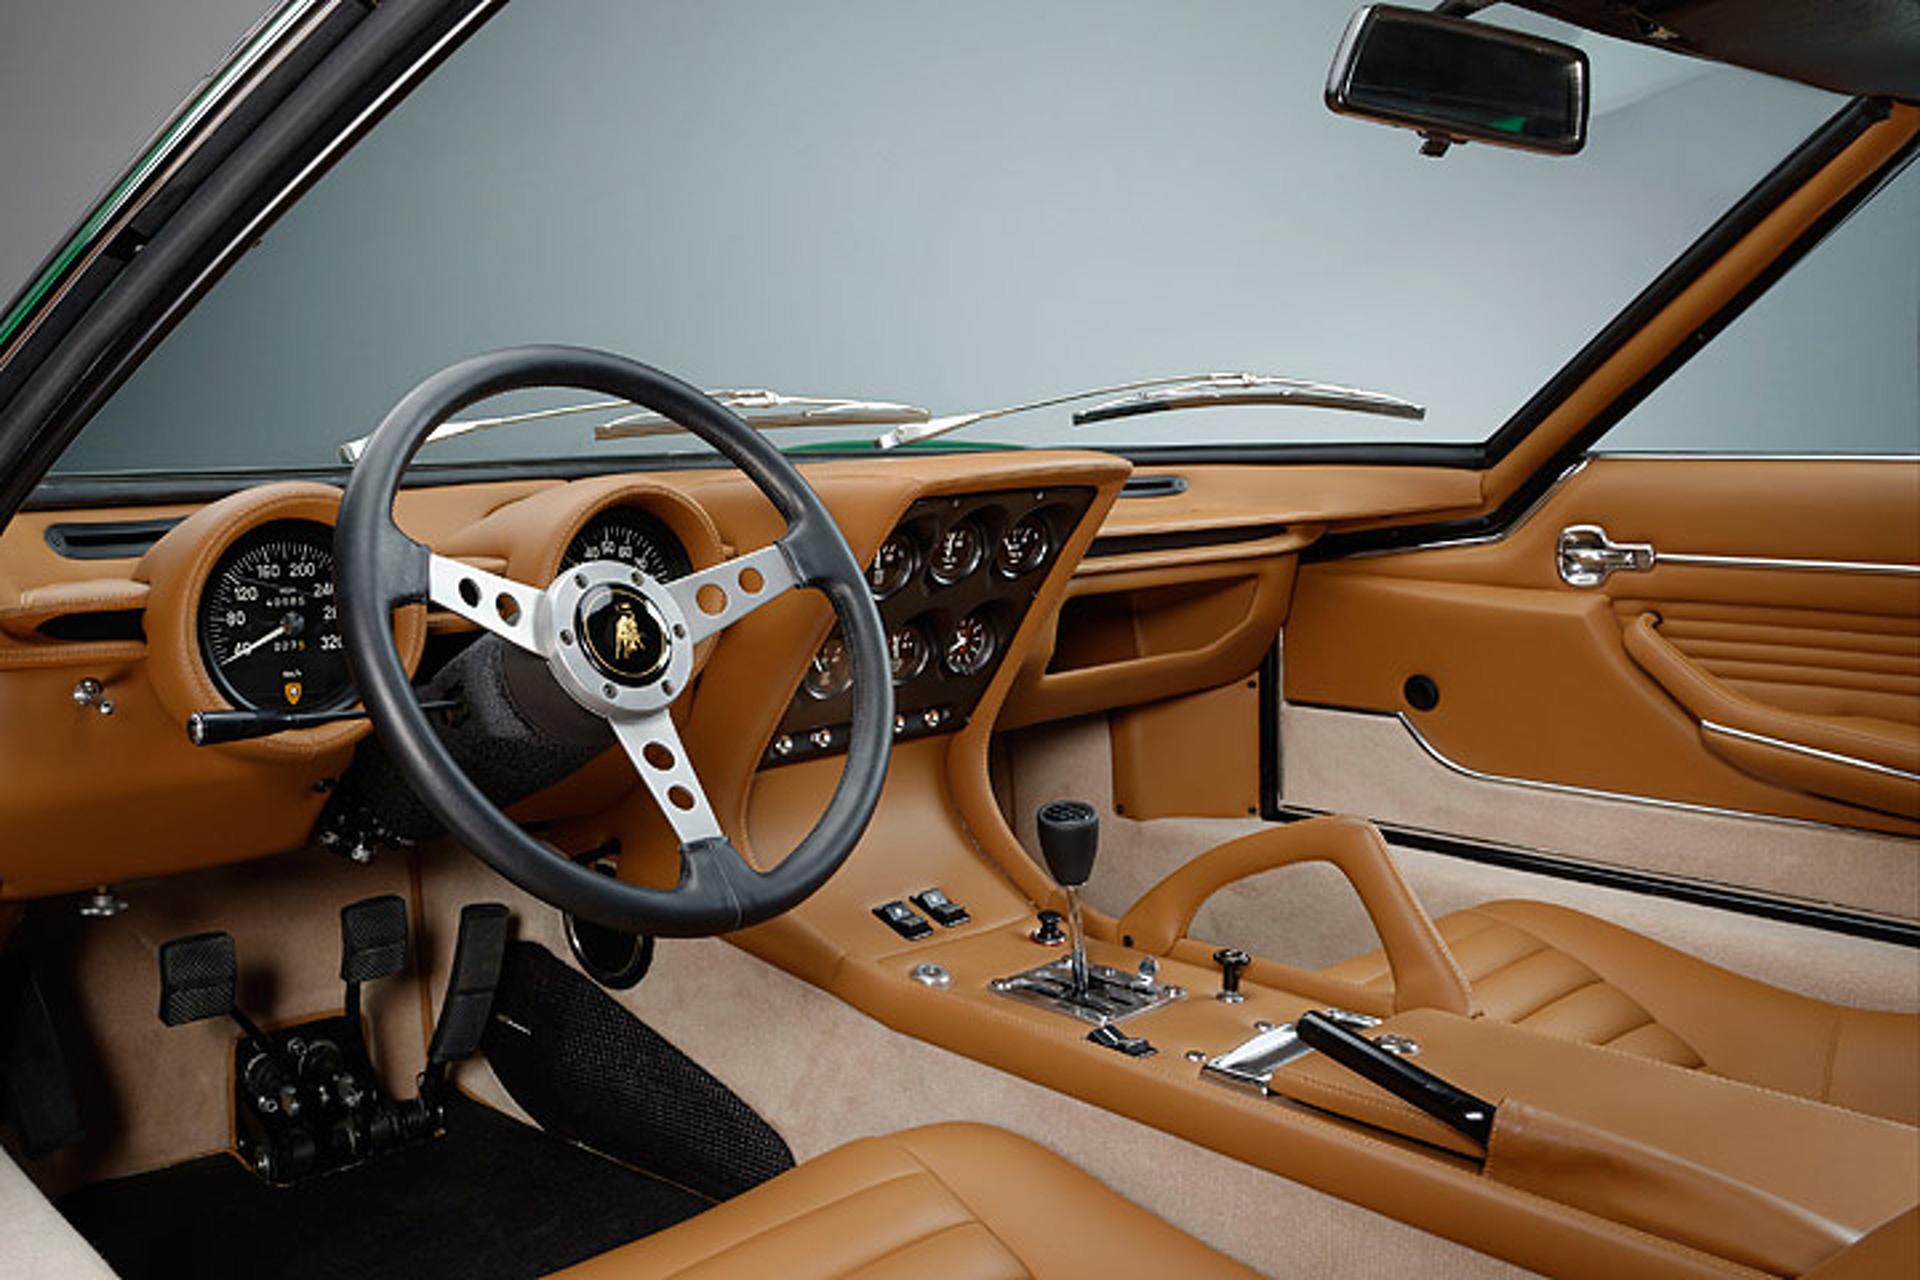 Lamborghini Has Returned this '71 Miura to Like-New Condition